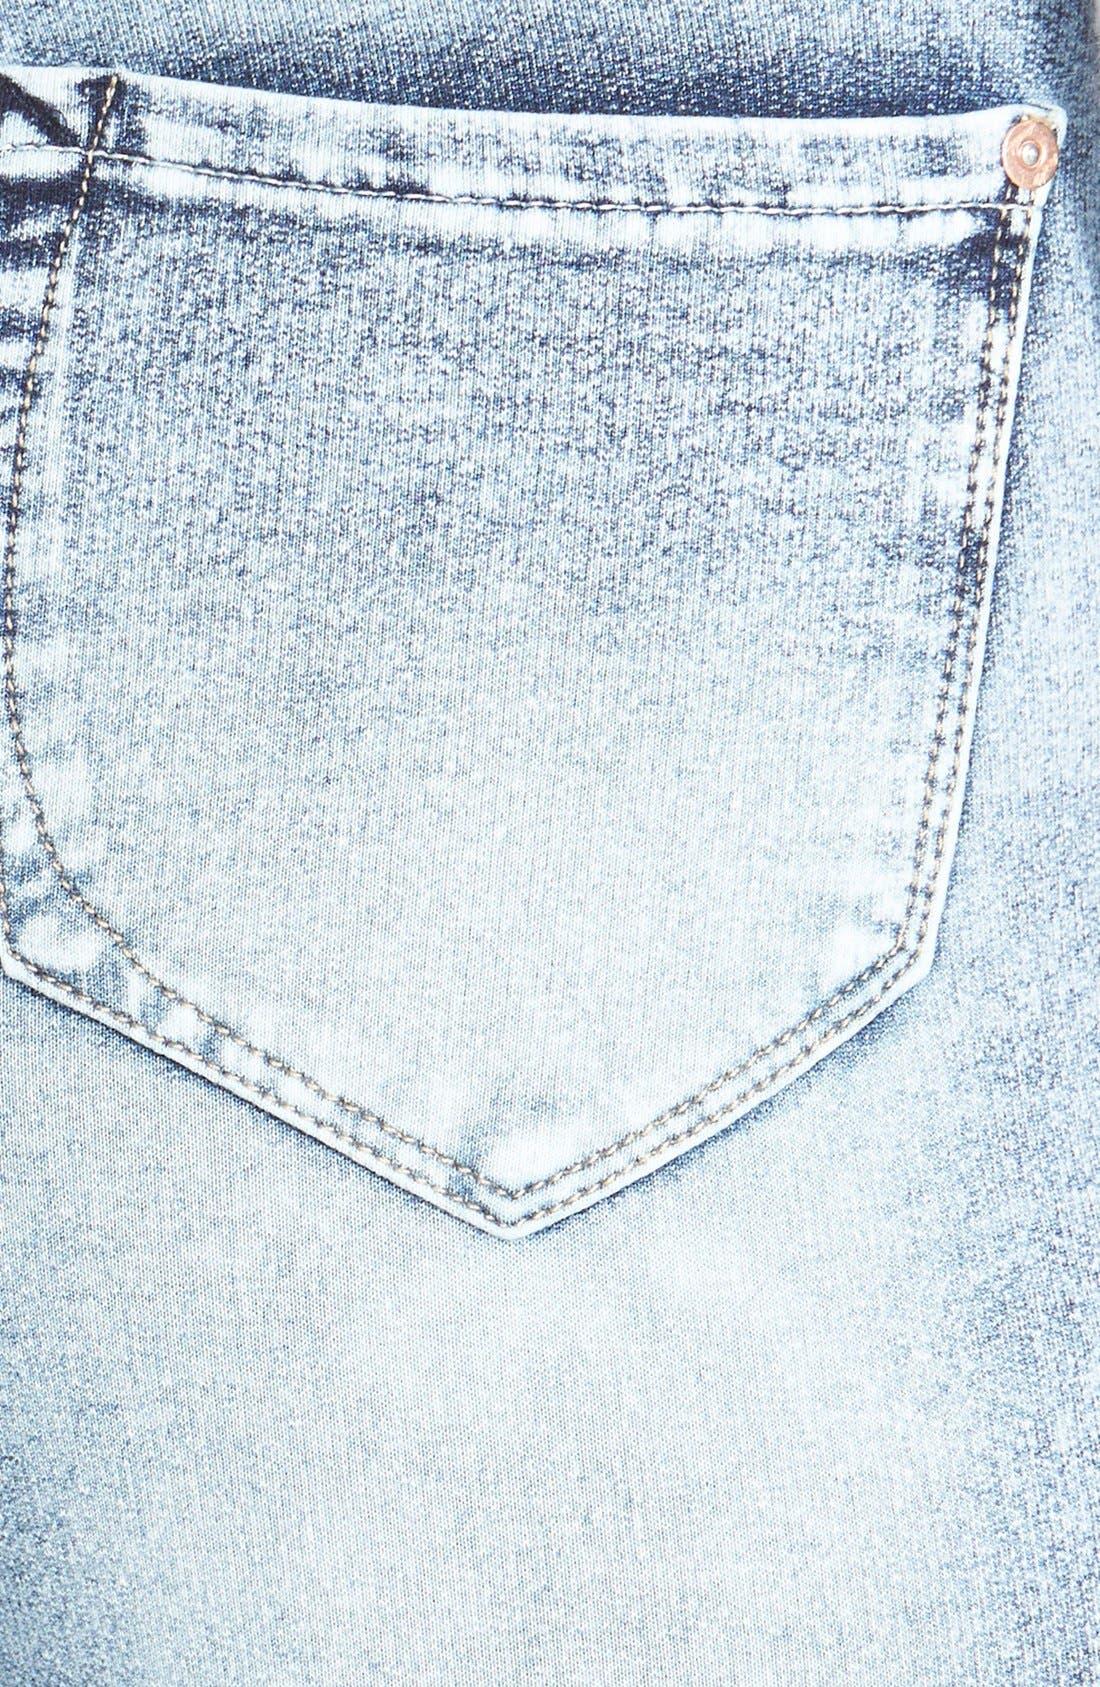 Alternate Image 3  - kensie 'Ankle Biter' Acid Wash French Terry Skinny Jeans (Grey Acid)